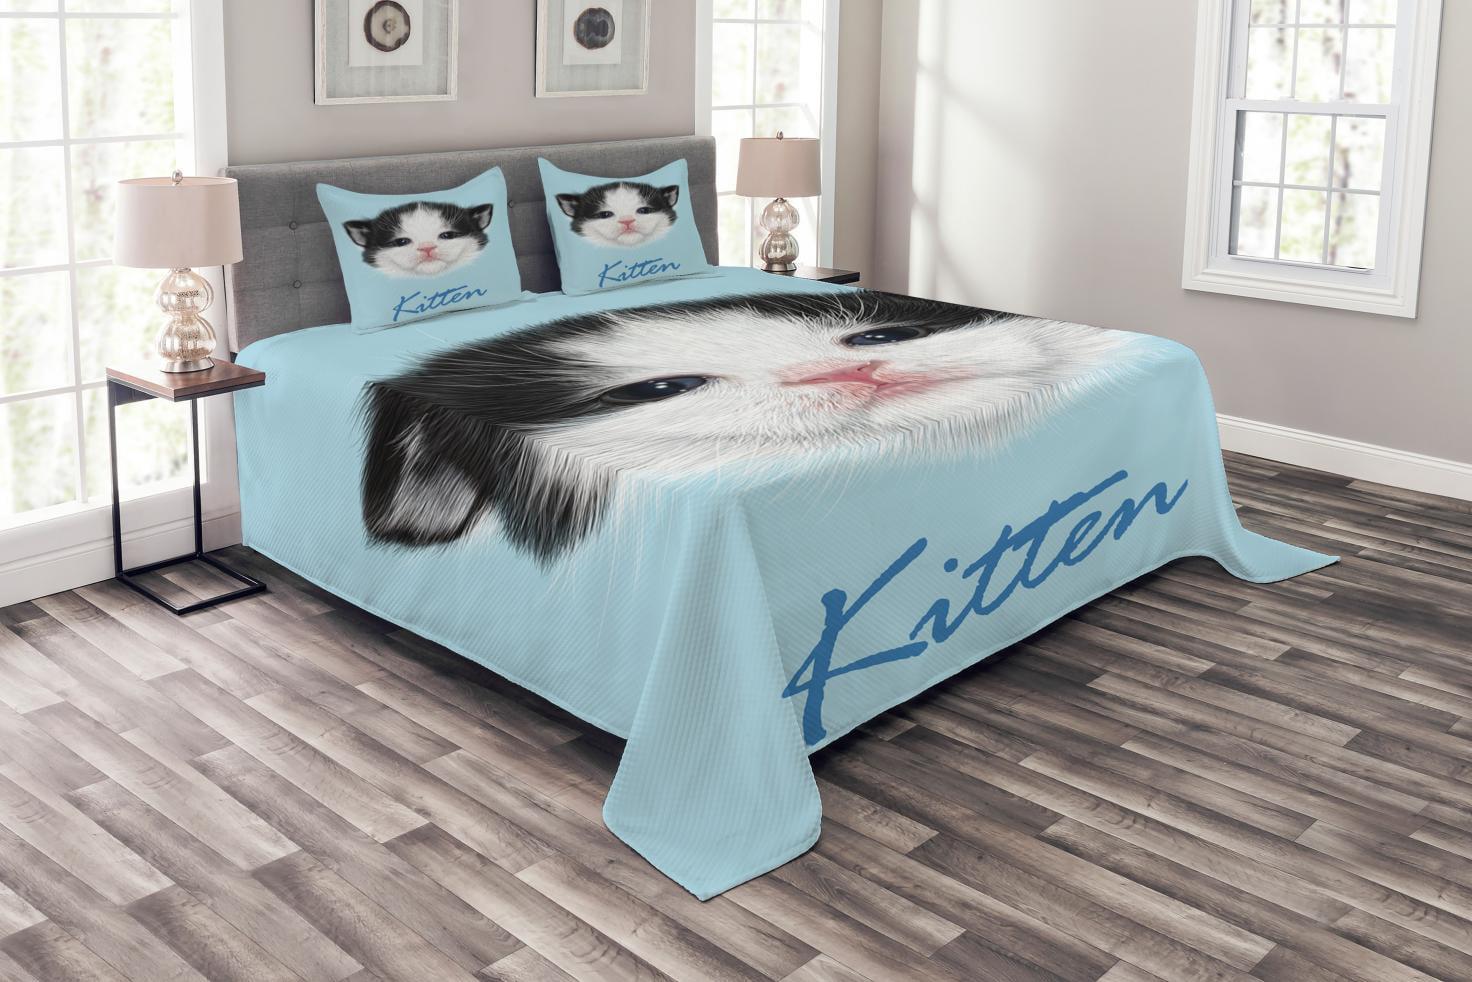 Cartoon Bedspread Set, Portrait of Domestic Kitten Newborn Bicolor Furry Head Pink Wet Nose Artwork,... by Kozmos